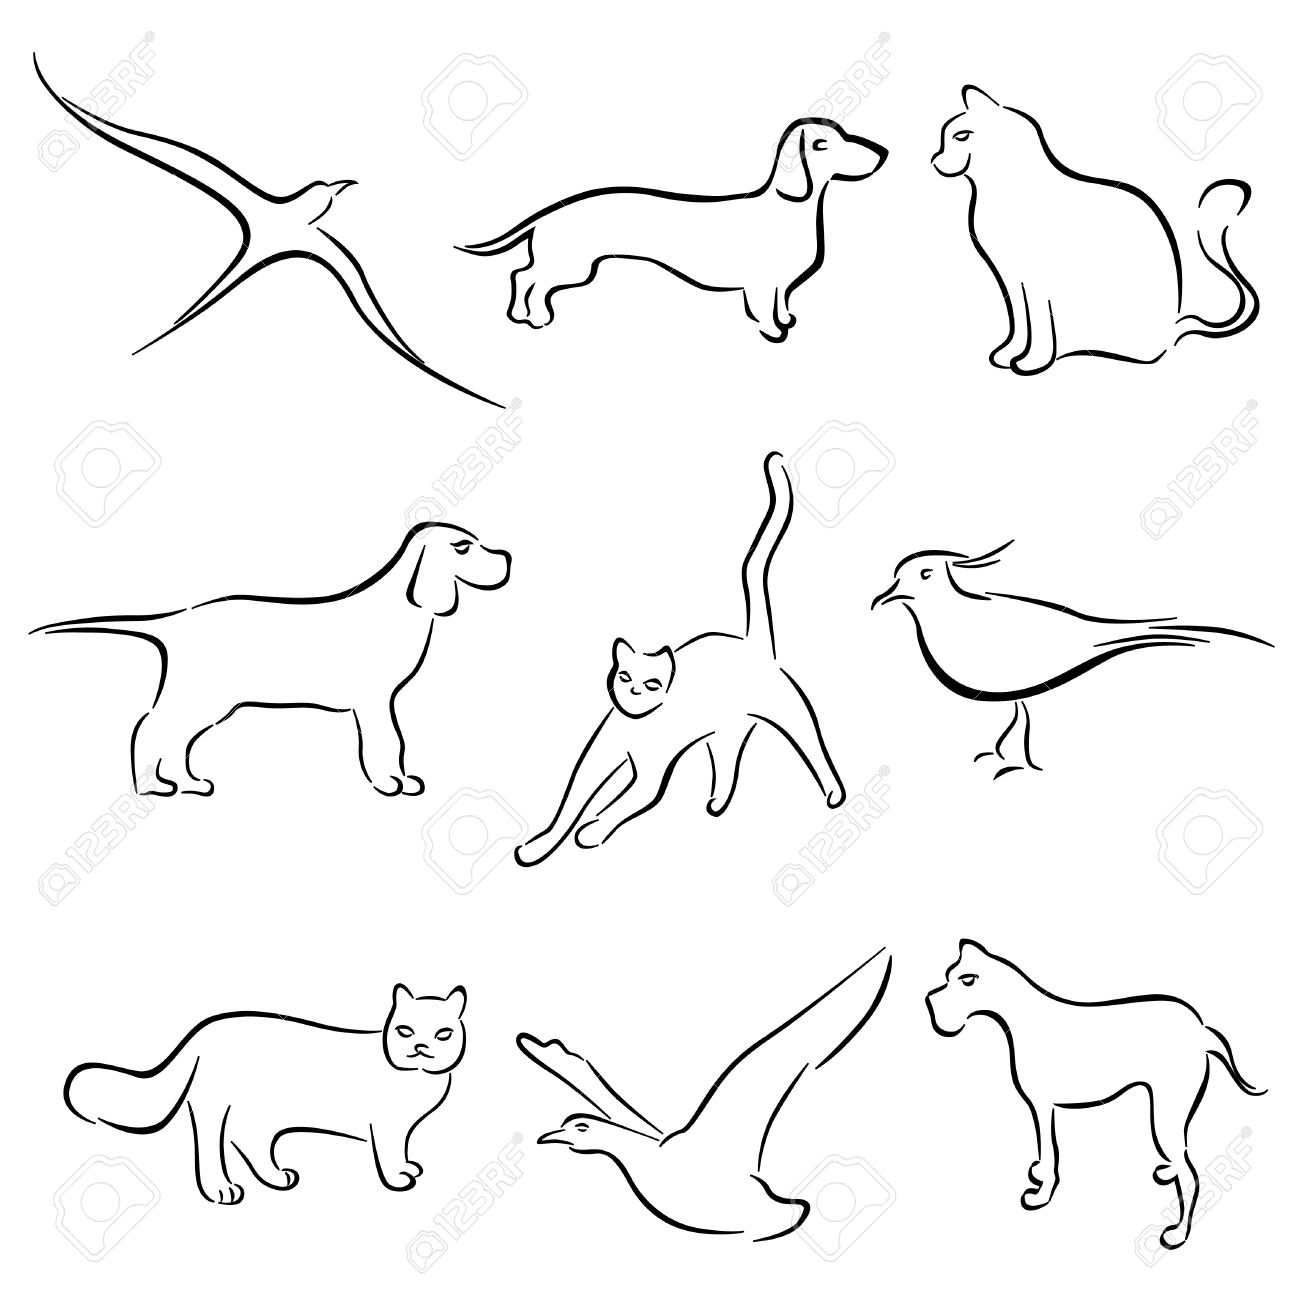 dog cat rabbit animal drawing vector royalty free cliparts